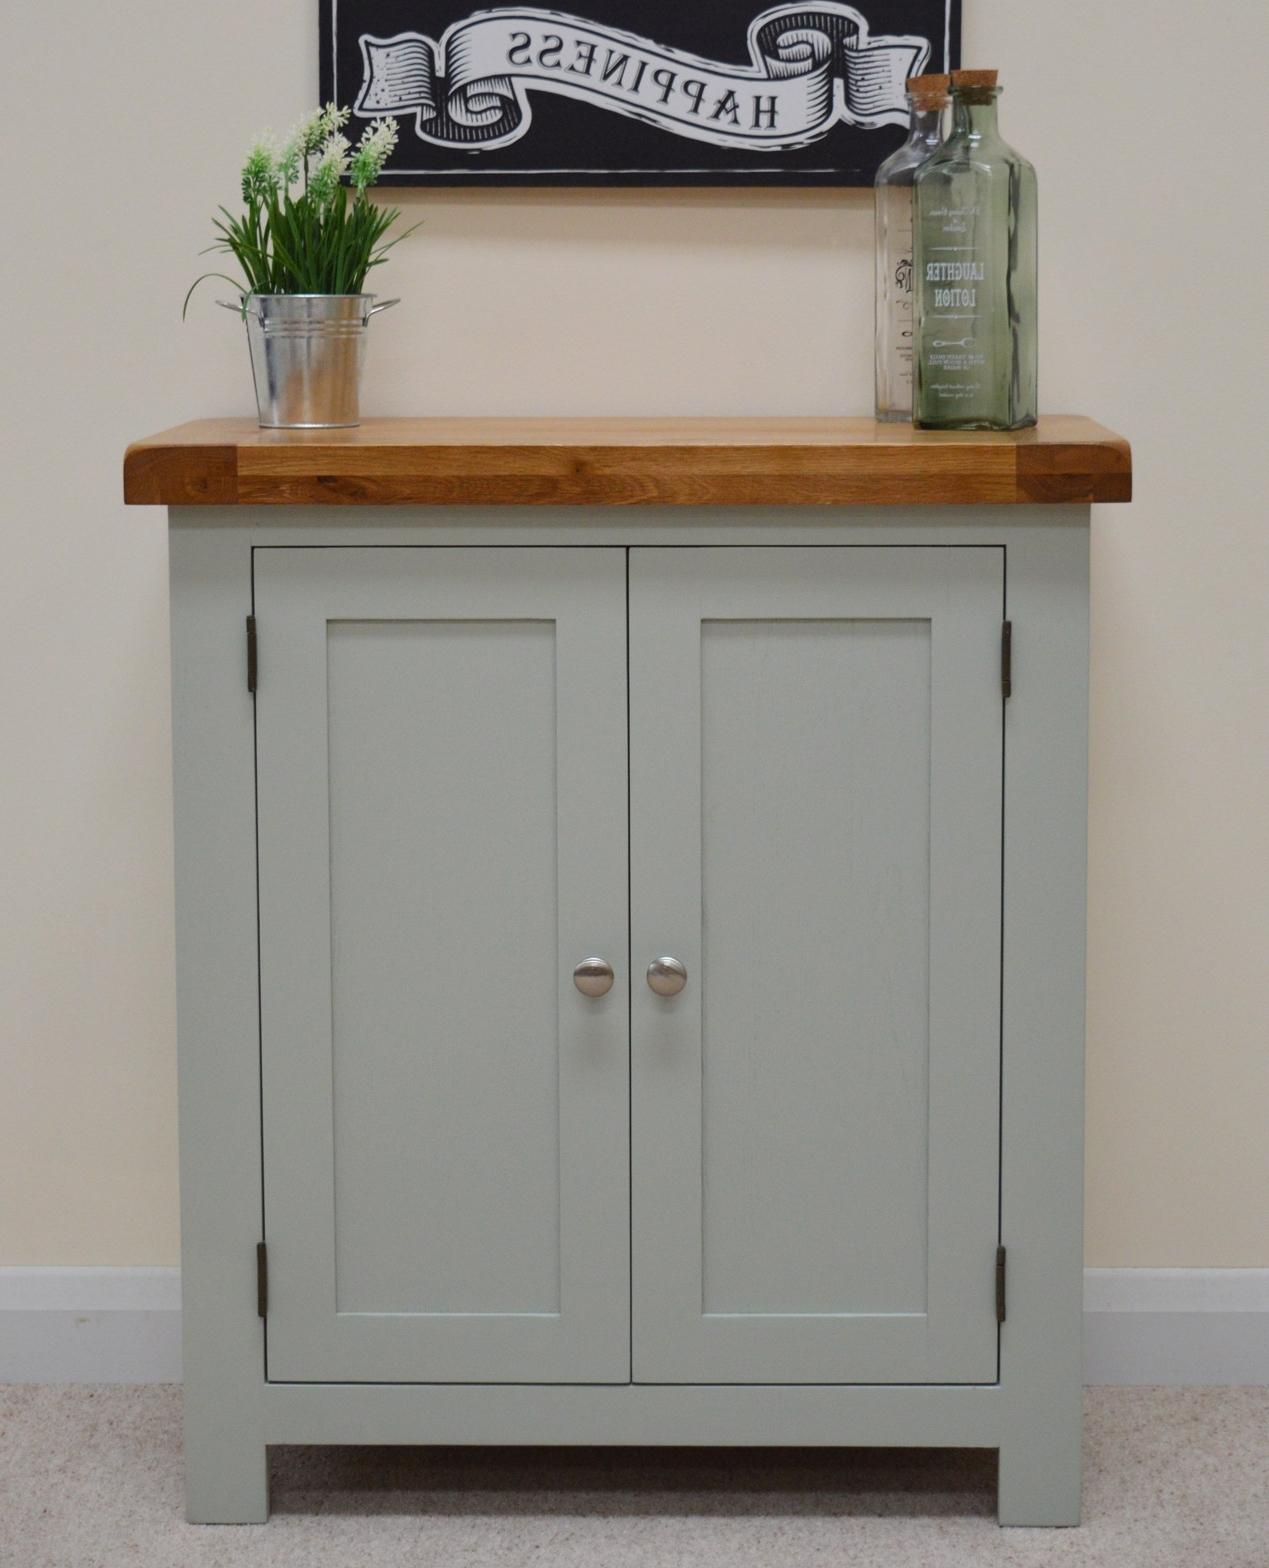 Oak Linen Cupboard For Well Known Camborne Painted Oak Linen Cupboard / Cabinet In Sea Green / Sage (View 10 of 15)